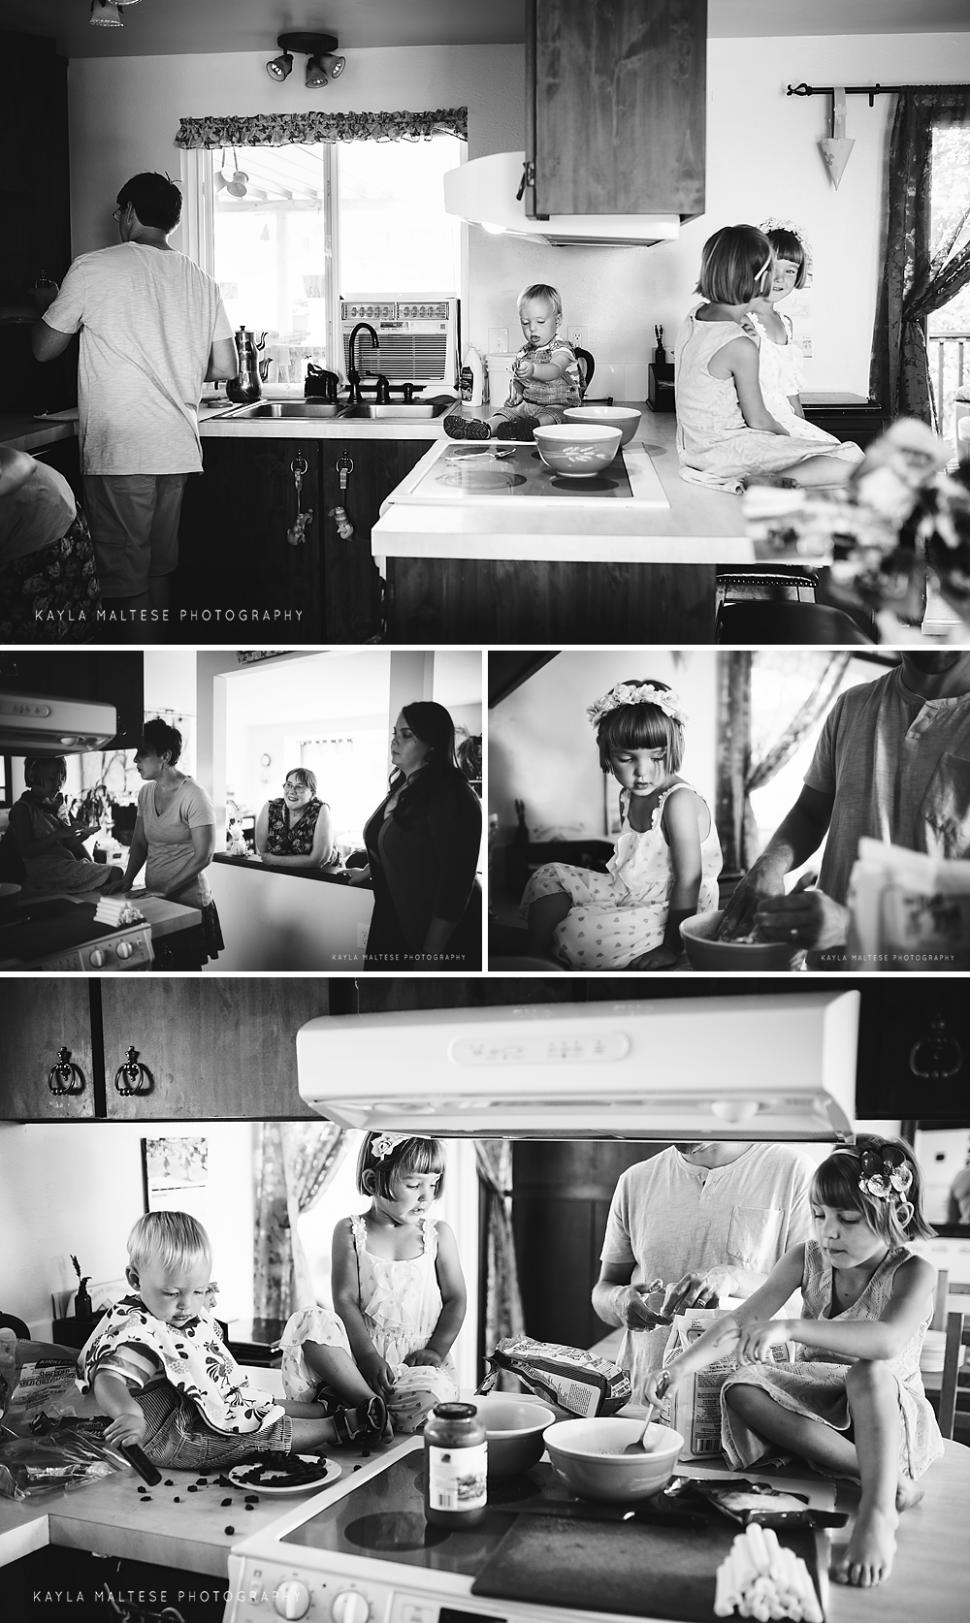 lifestyle storytelling photography mentoring kayla maltese  lifestyle storytelling photography mentoring